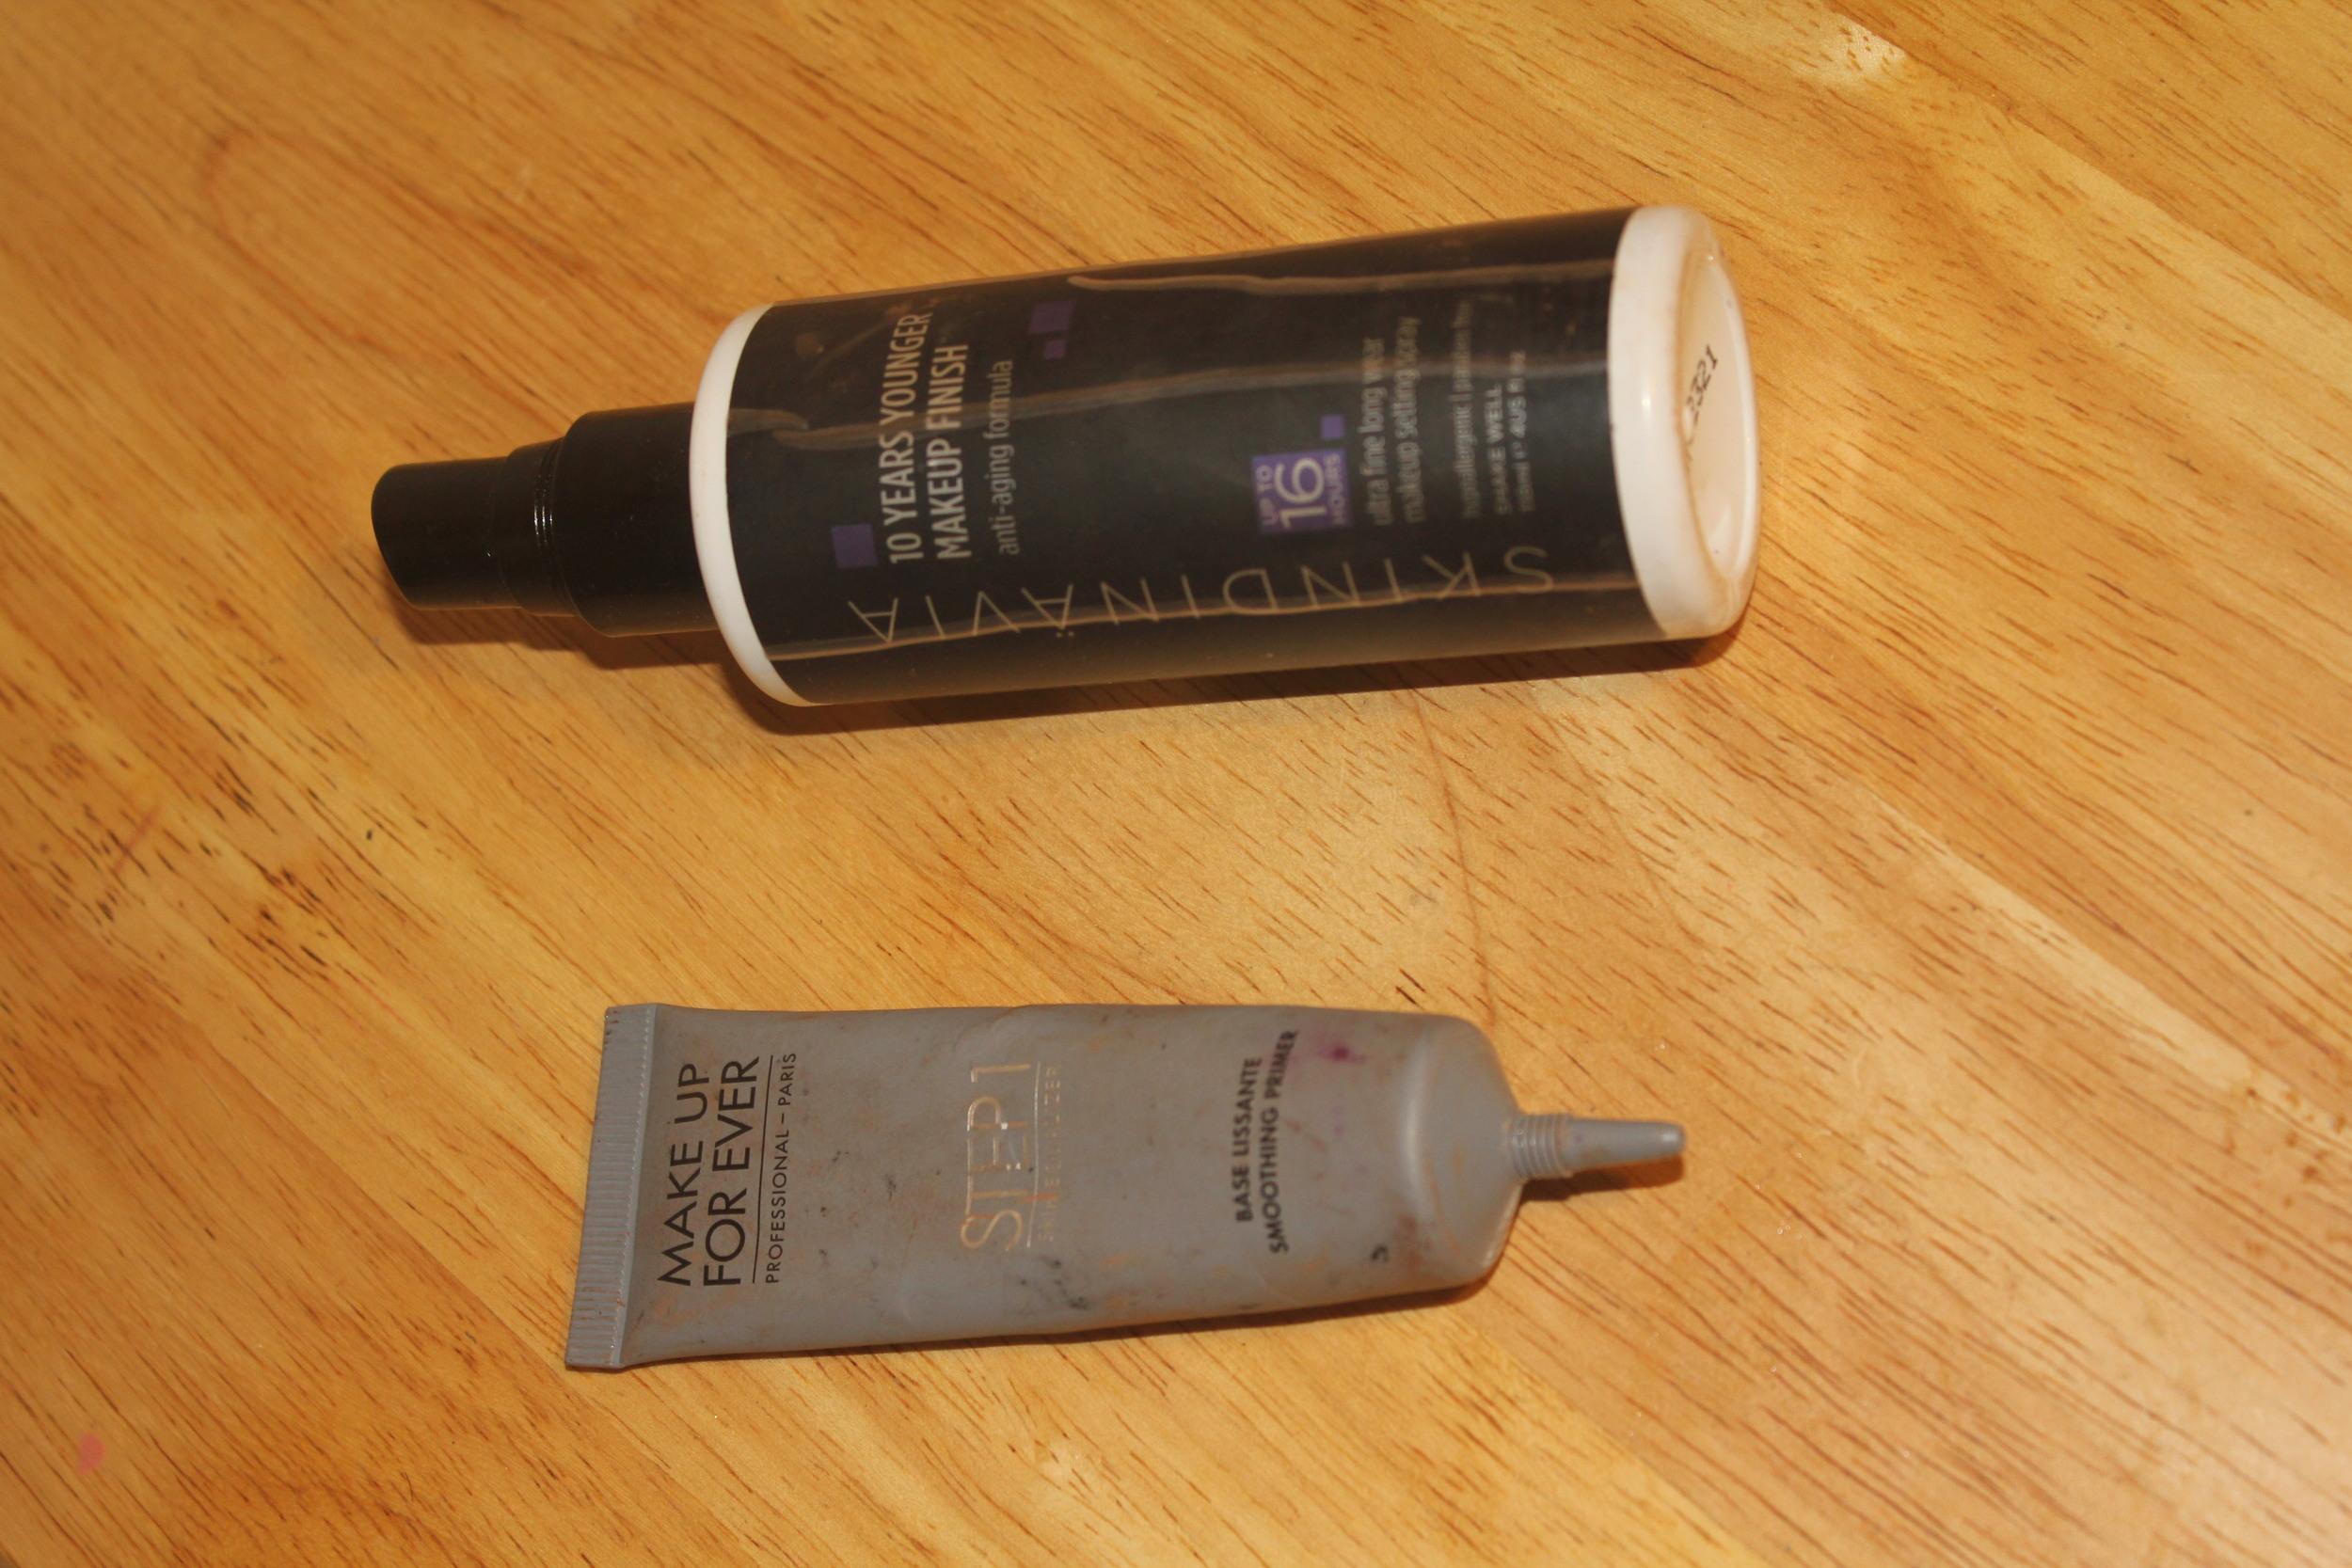 MakeUp Forever primer and Skindinavia Makeup Finishing spray